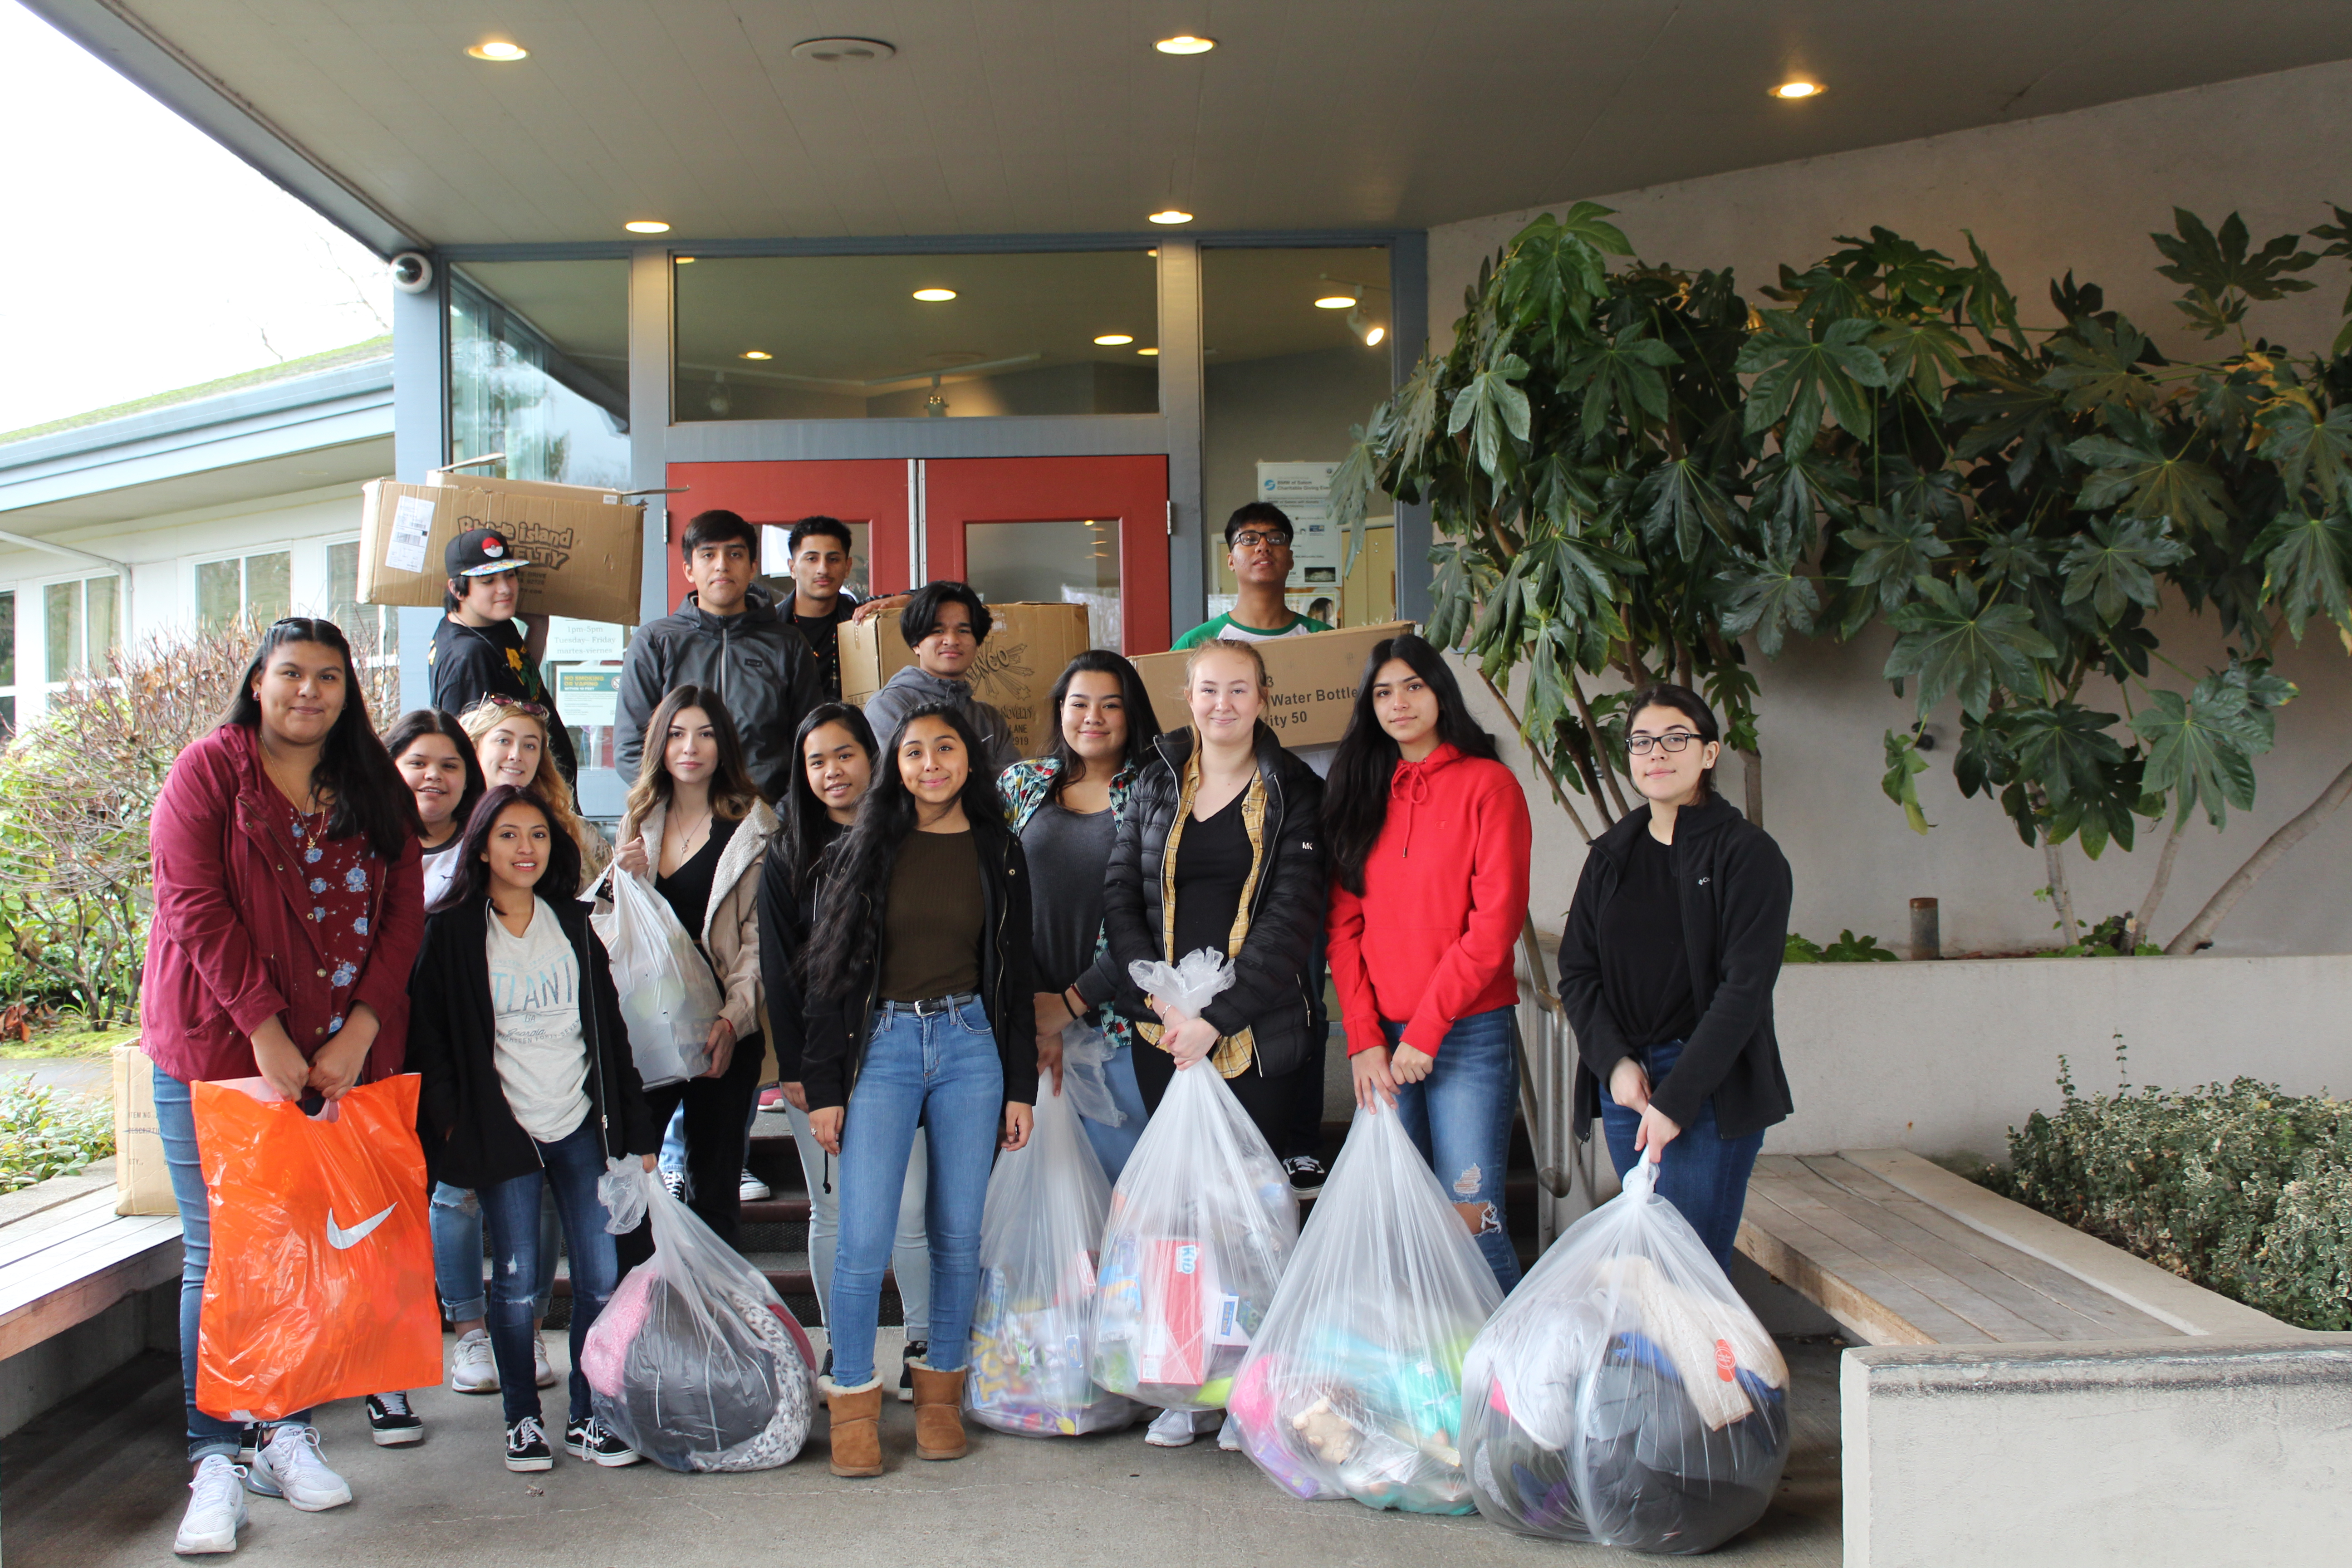 McKay Link donates to Family Building Blocks